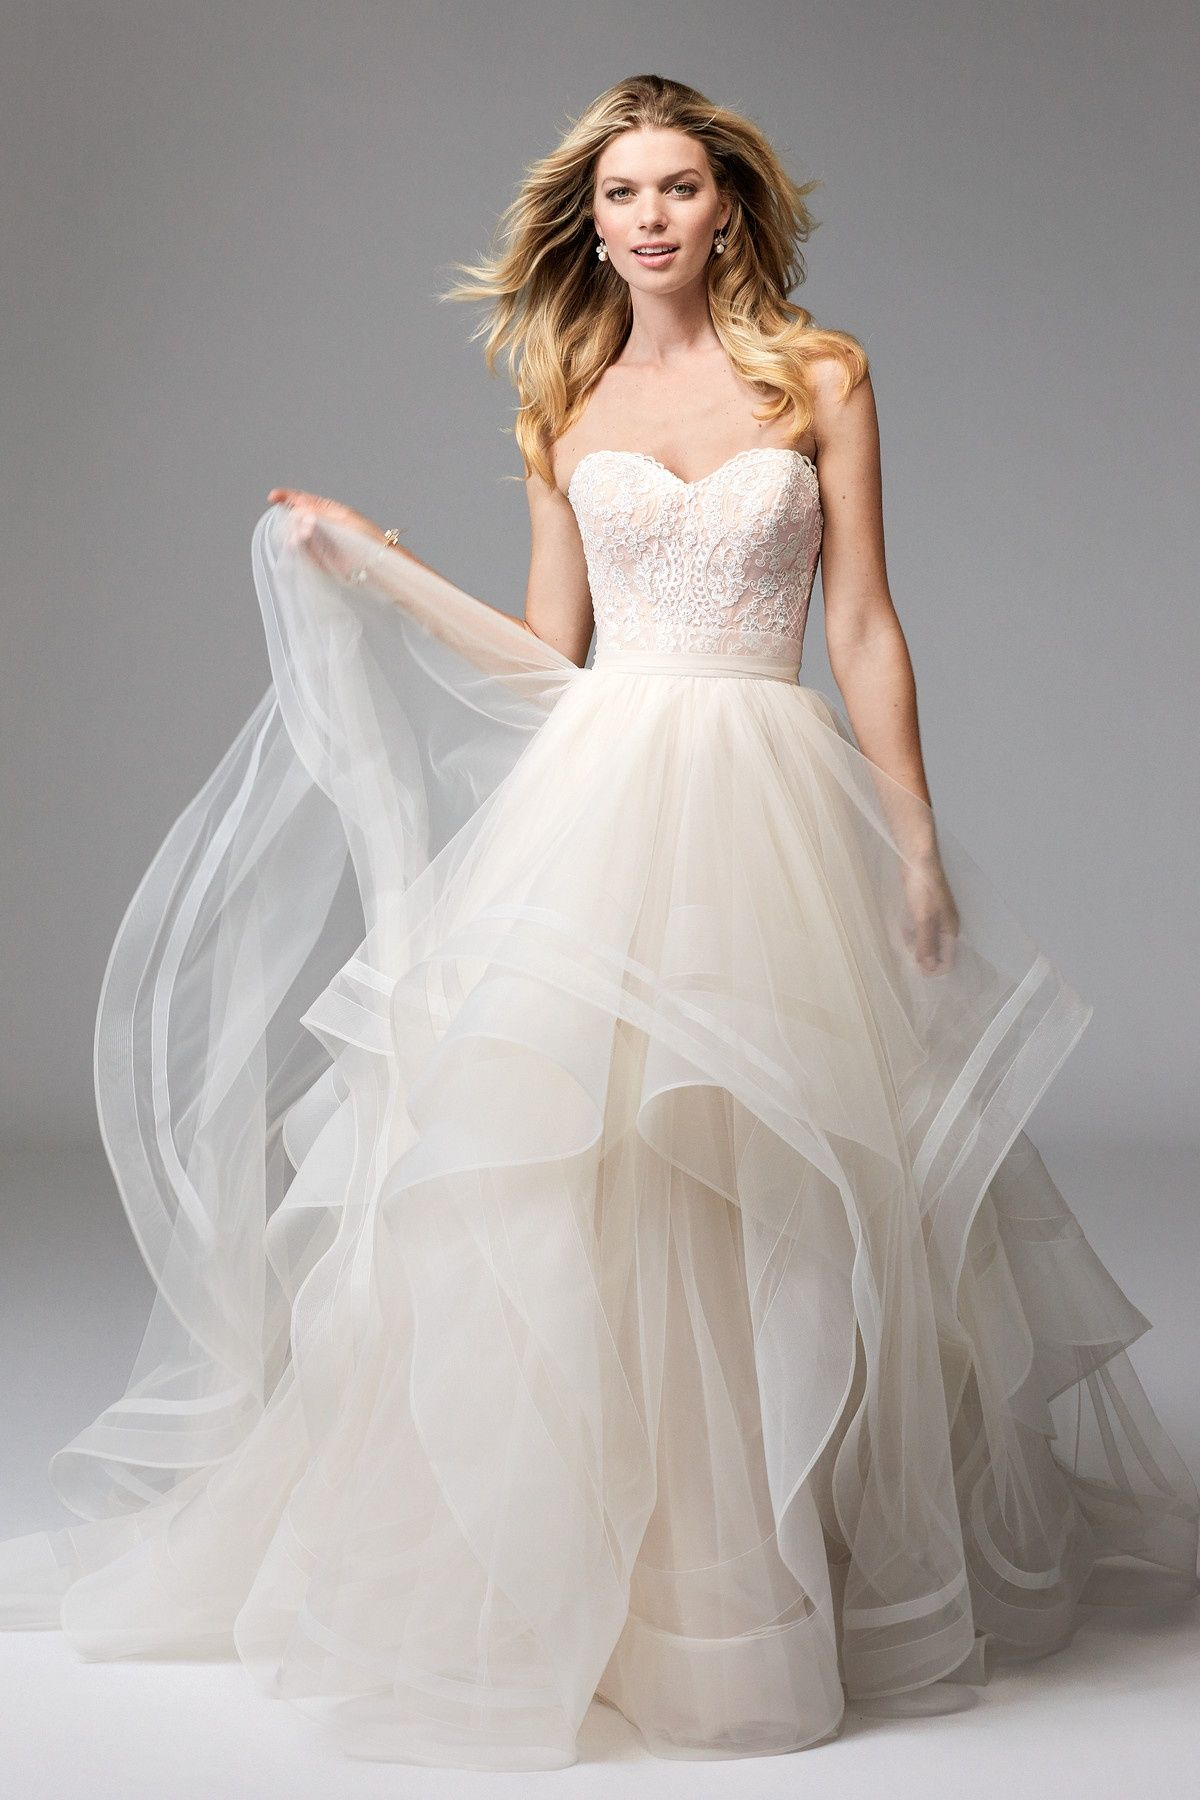 Effie Skirt Bridal Skirts Wedding Dress Sizes Watters Wedding Dress